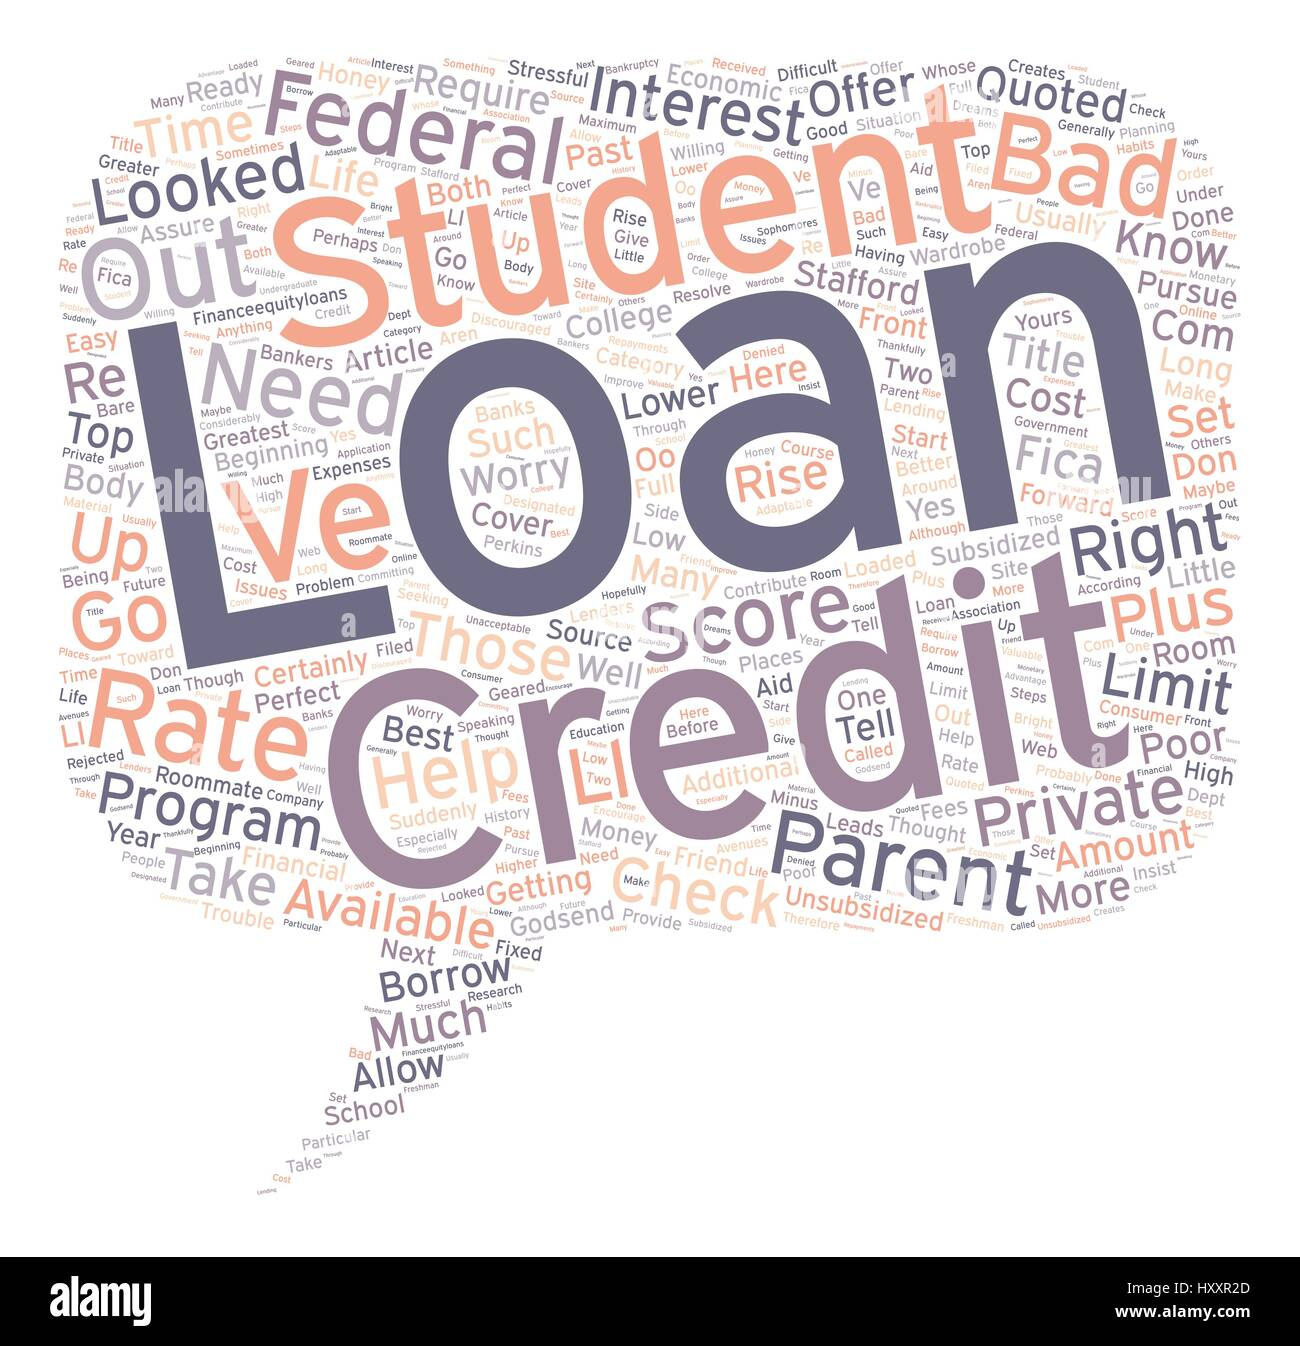 Schlechte Kredit Student Loan Können Sein A Geschenk Des